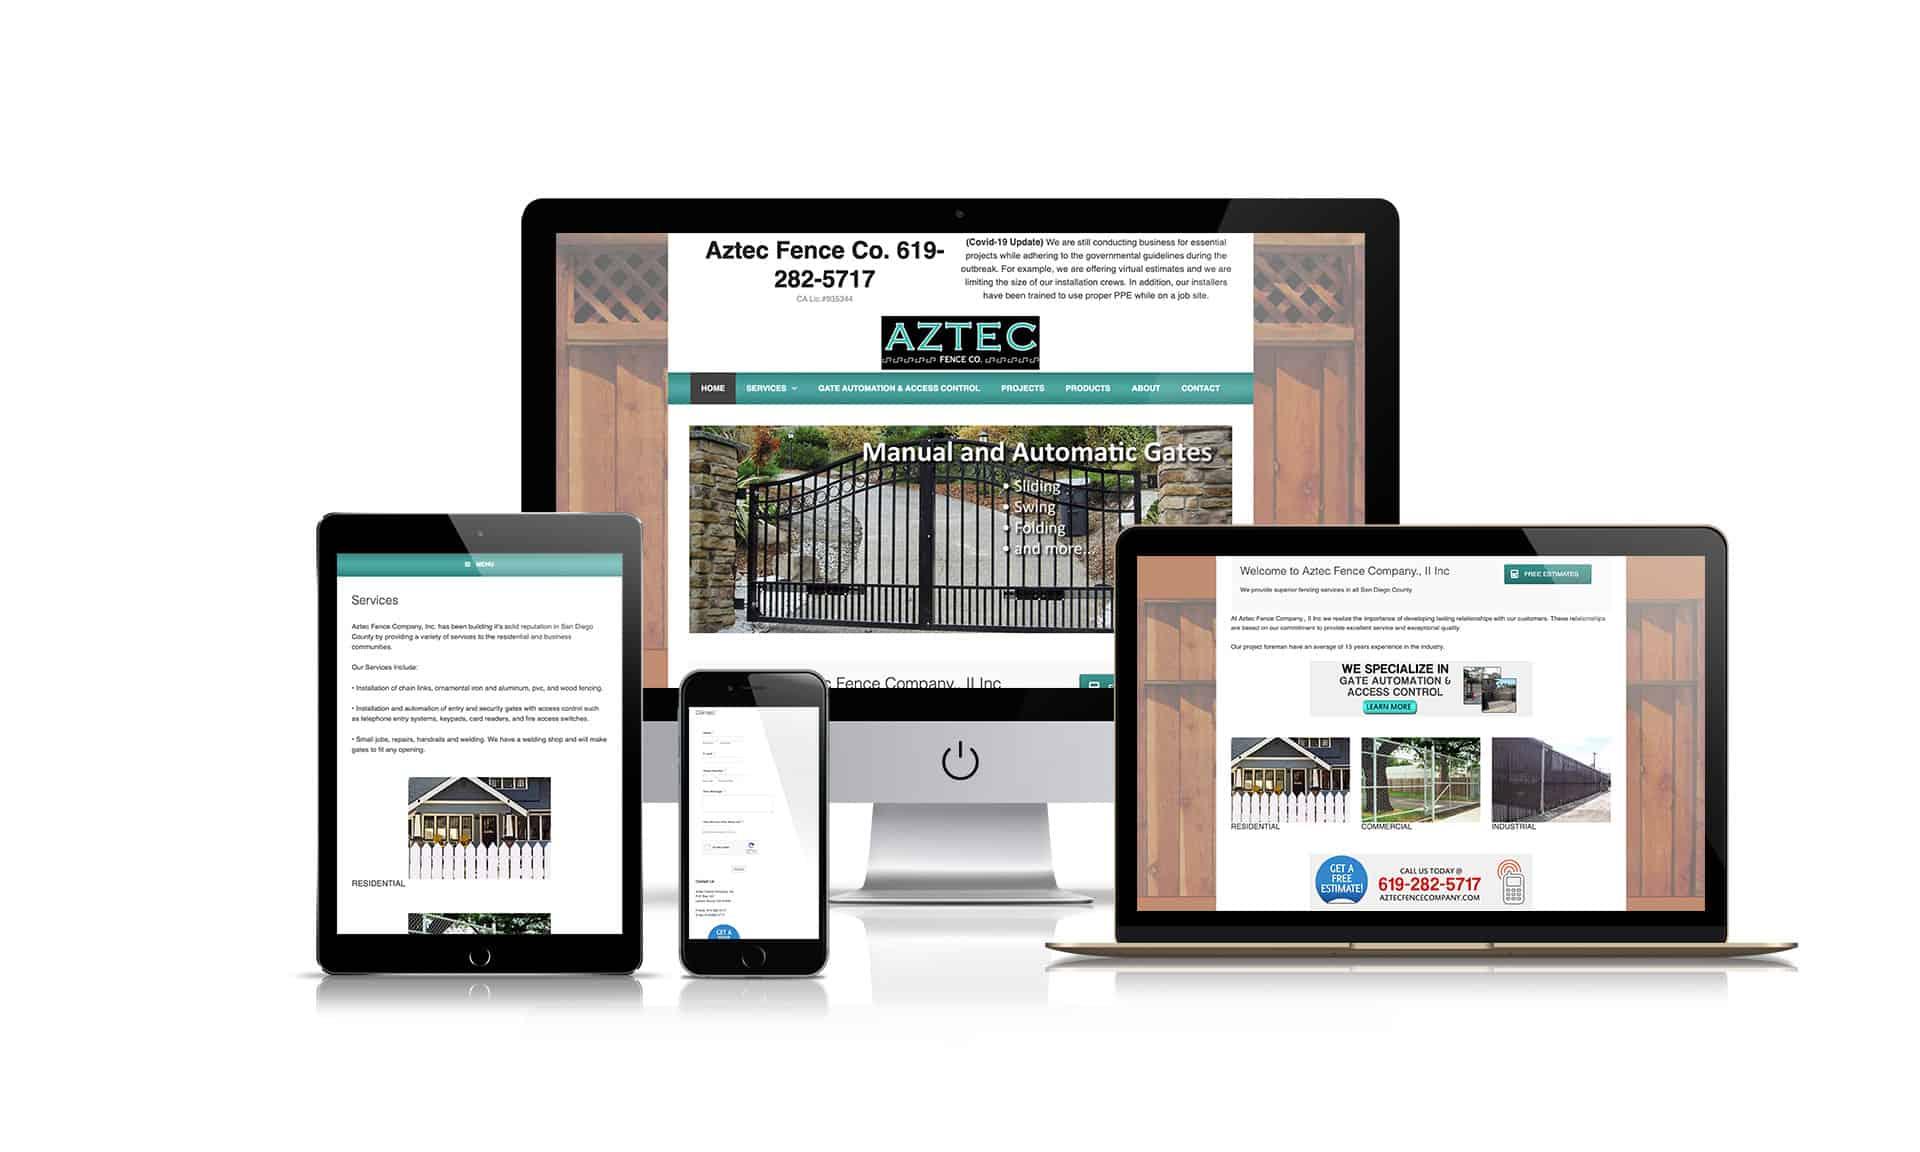 Aztec Fence Company - Website Design